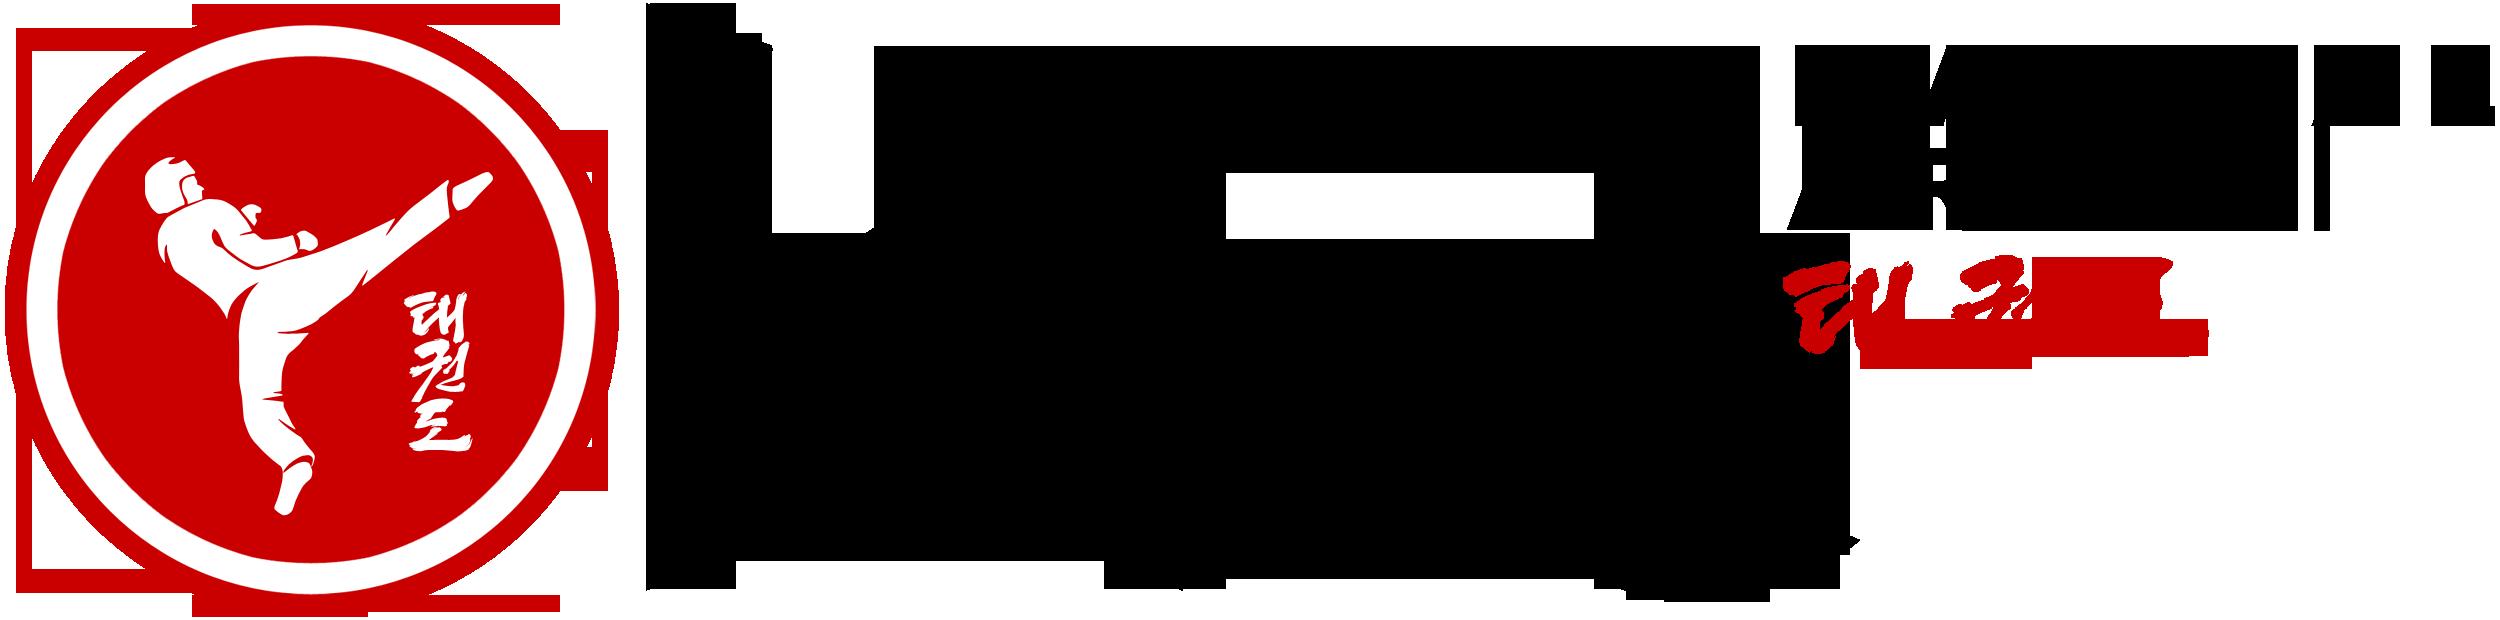 Sturminster Newton-KR Martial Arts 3